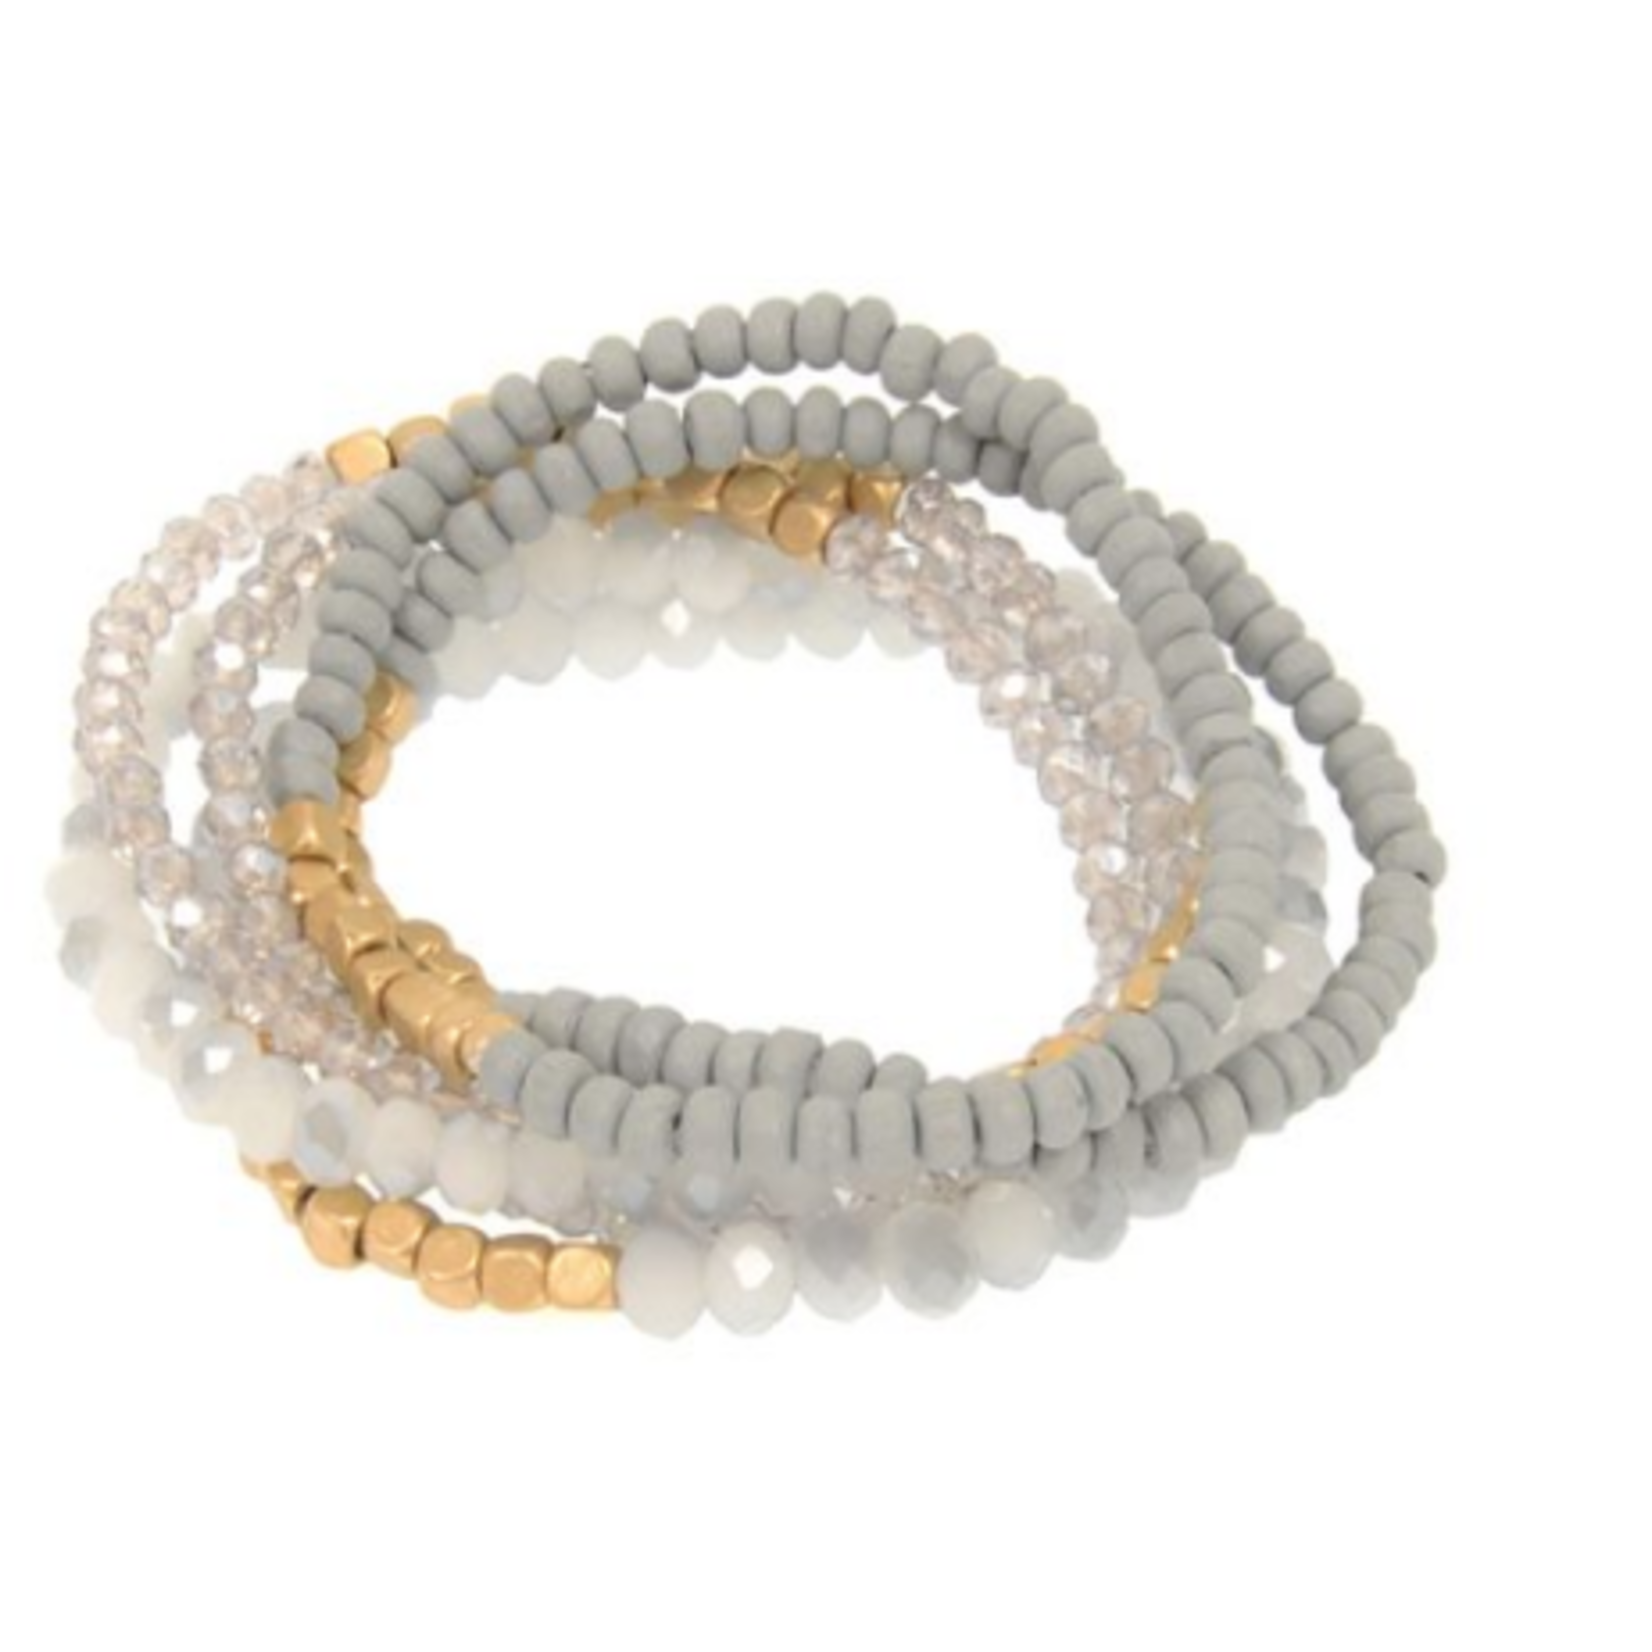 Joy Susan Joy Susan Light Grey Glass & Wood Bead Bracelet